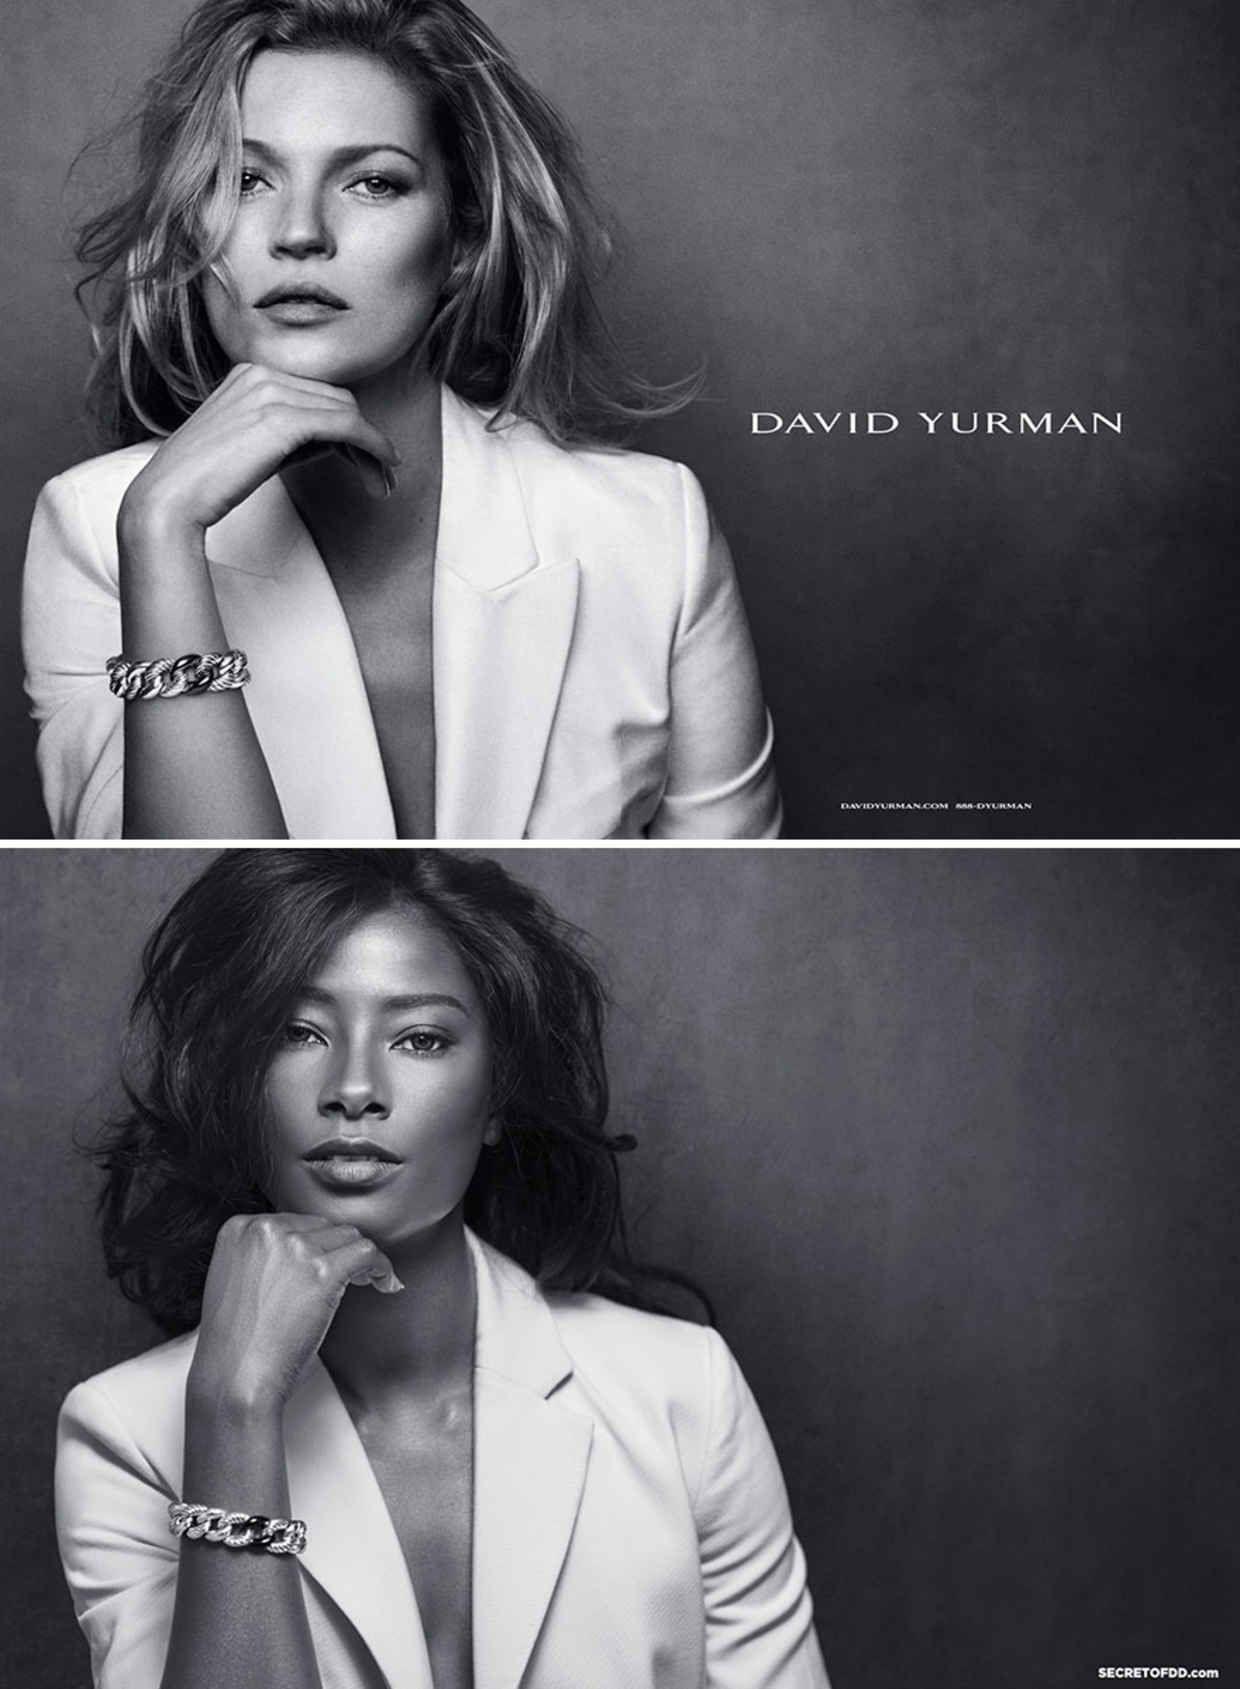 Model speaks our at lack of black faces on catwalk